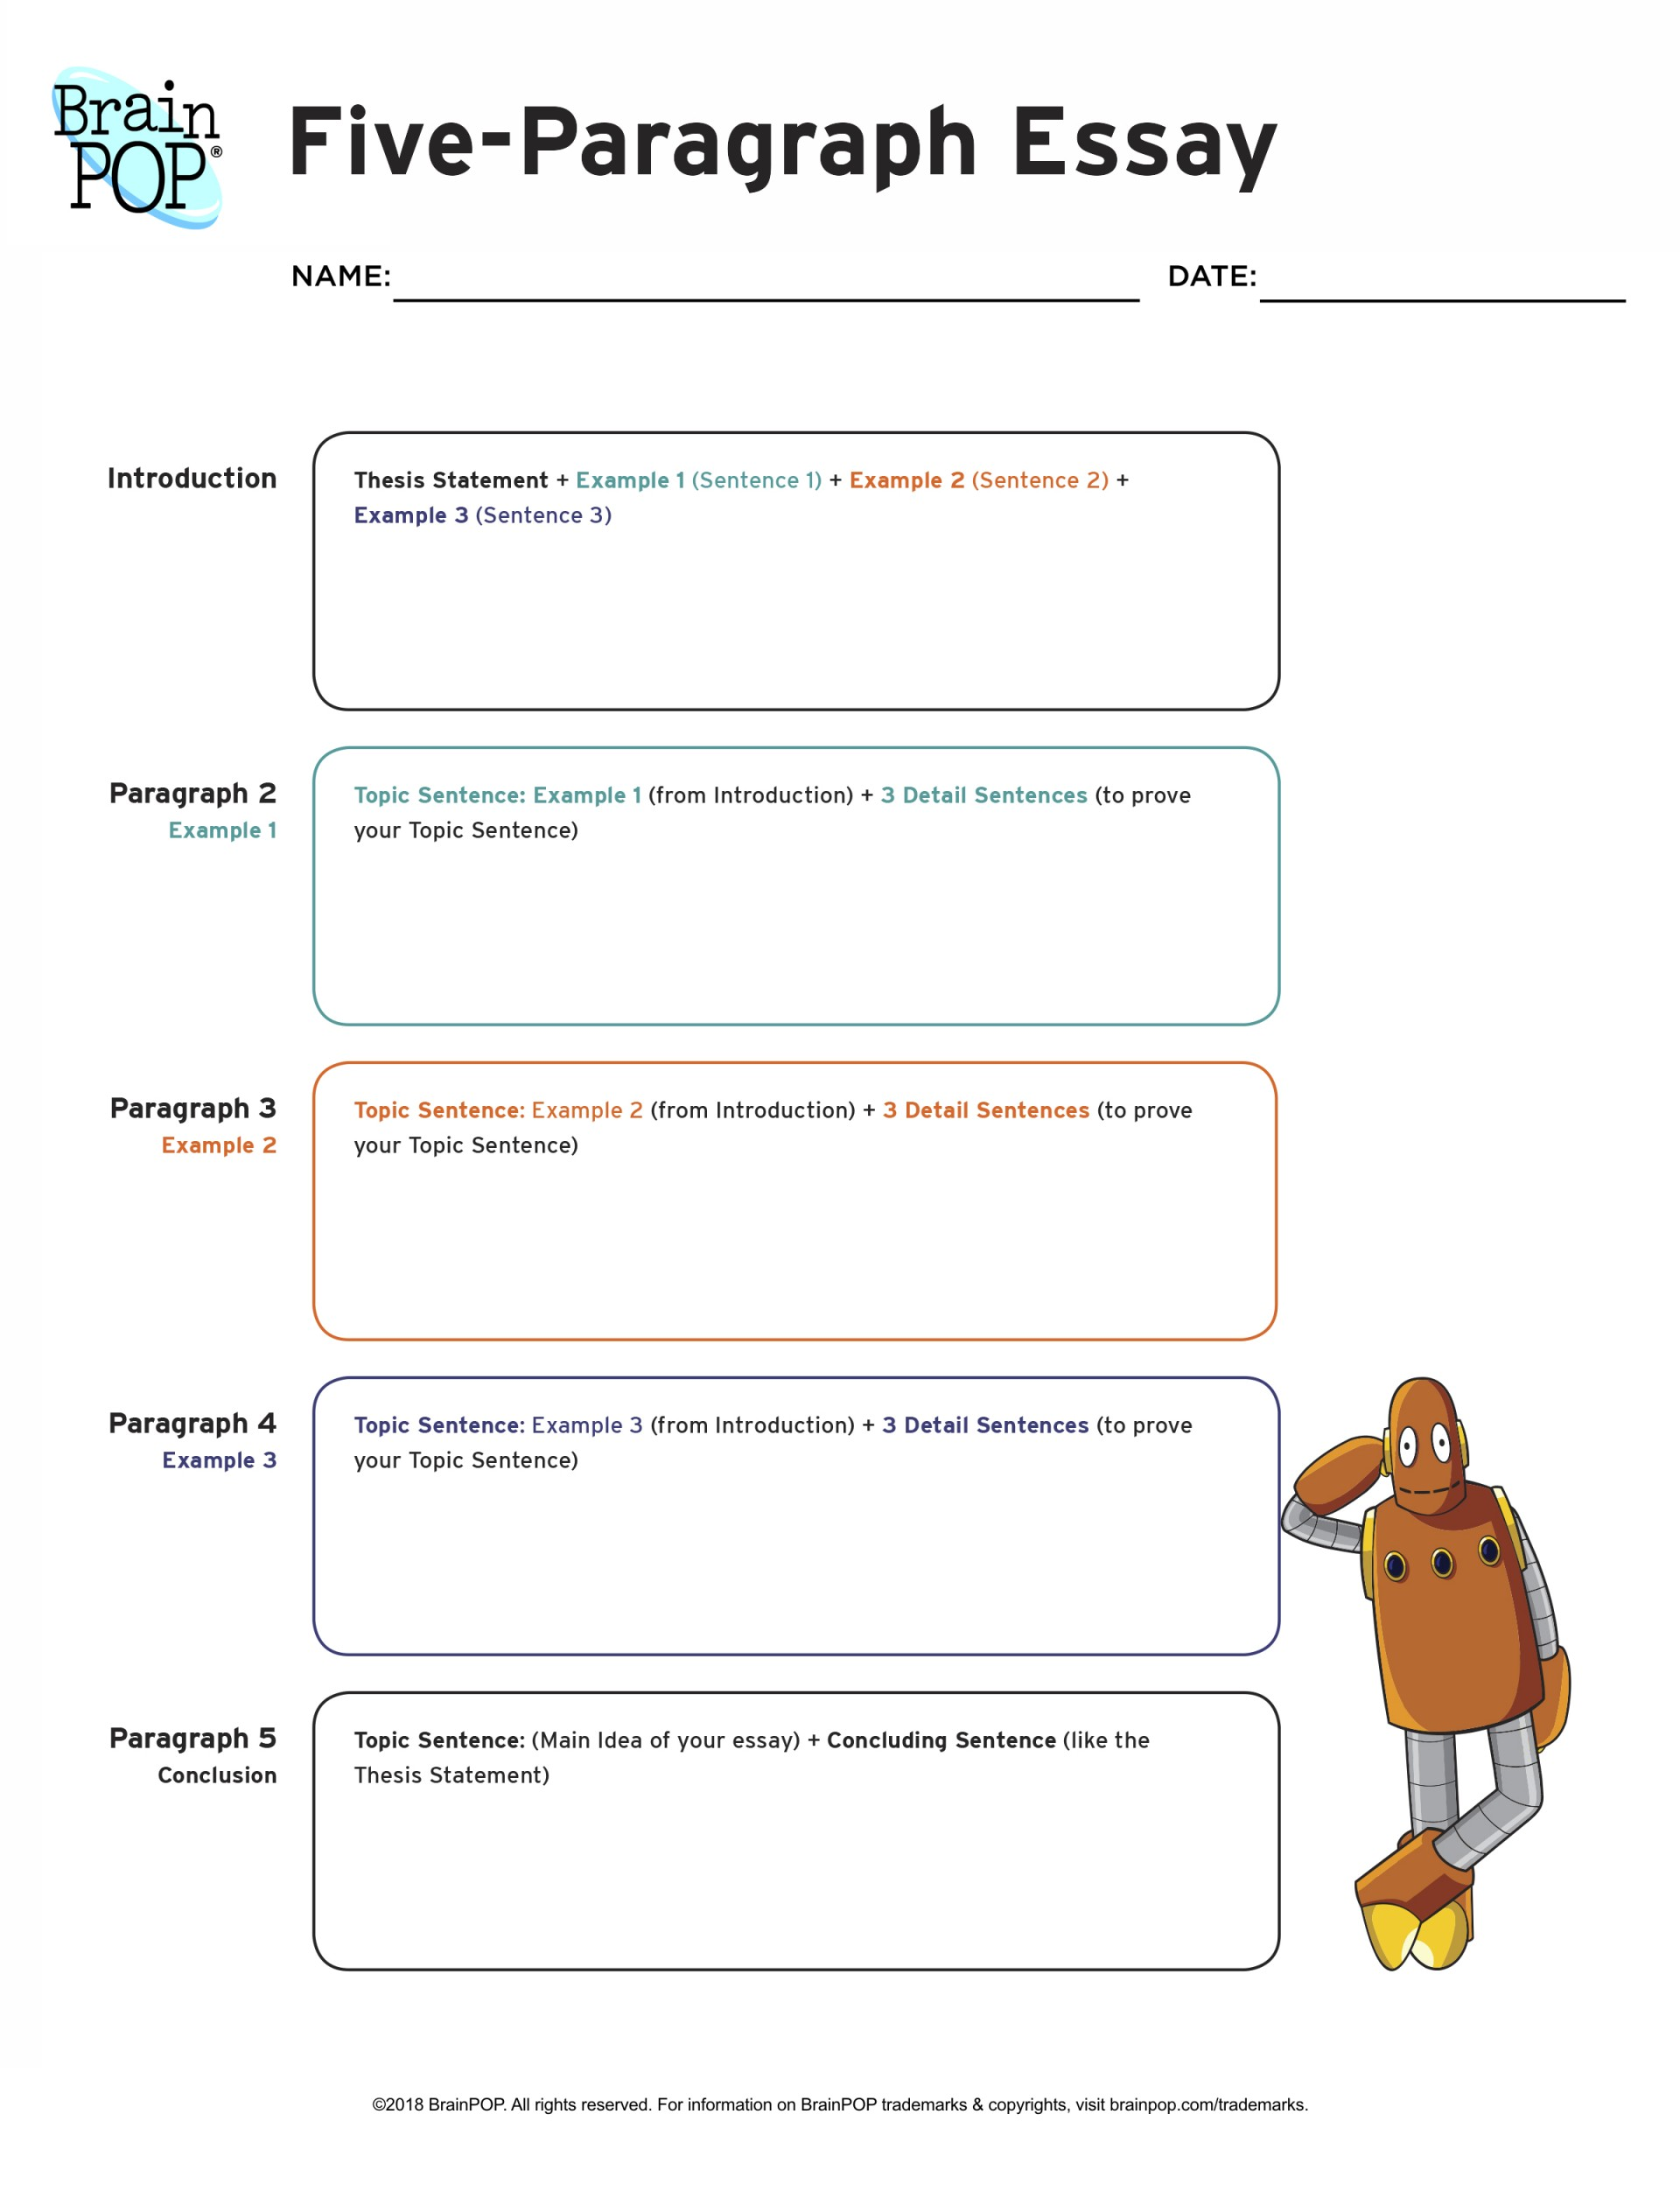 001 Essay Example Five Paragraph Graphic Wonderful Organizer 5 Middle School Pdf Organizer-hamburger 1920